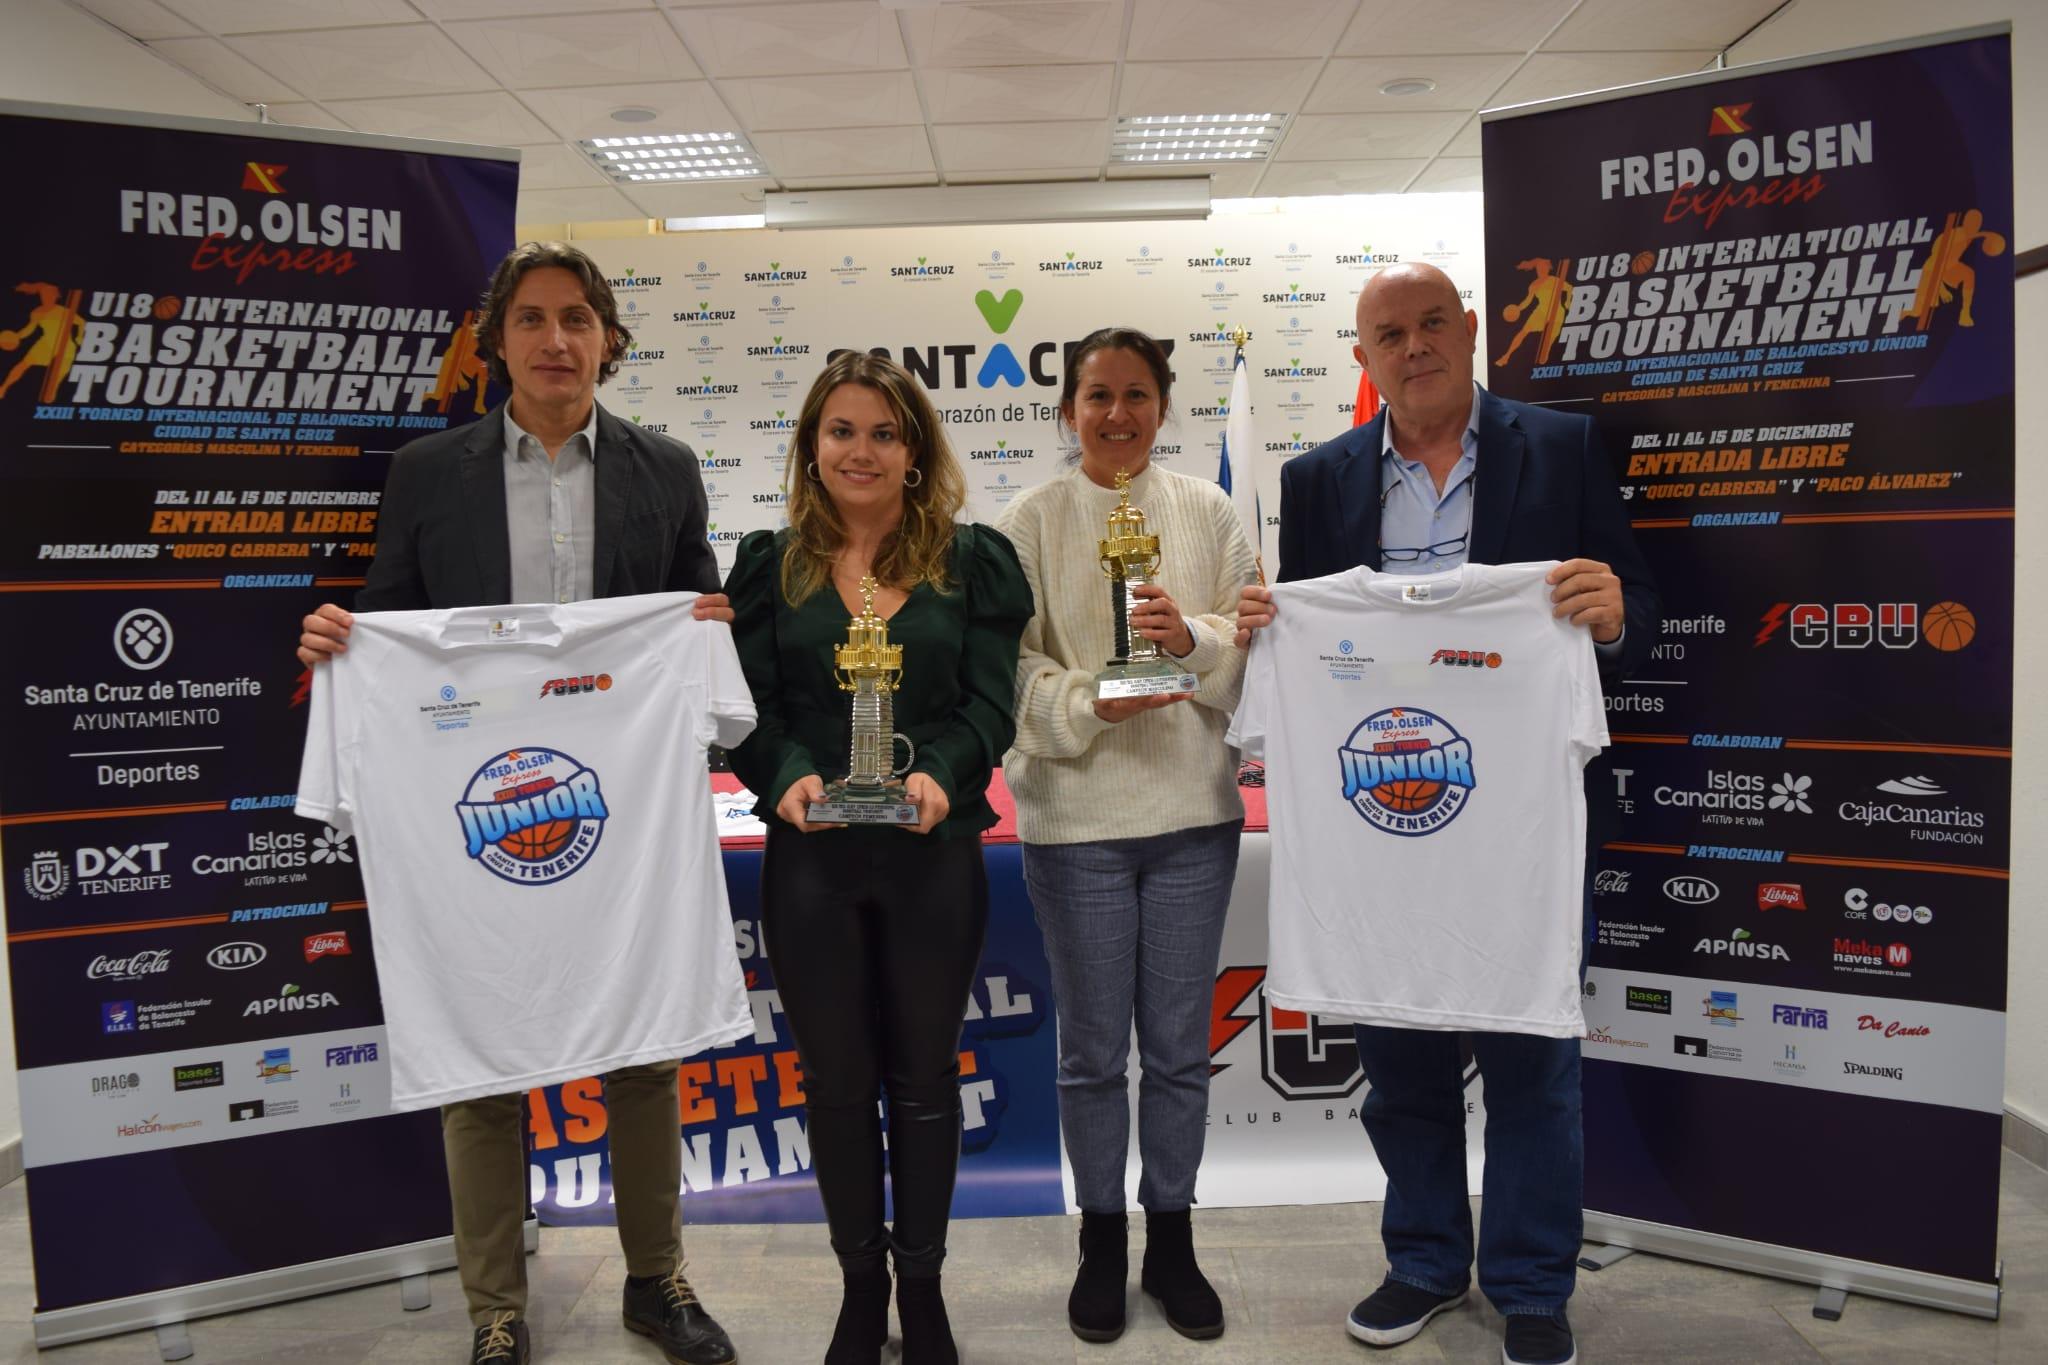 El 'XXIII Fred Olsen Express U18 International Basketball Tournament' mostrará lo mejor de la cantera europea en Santa Cruz de Tenerife